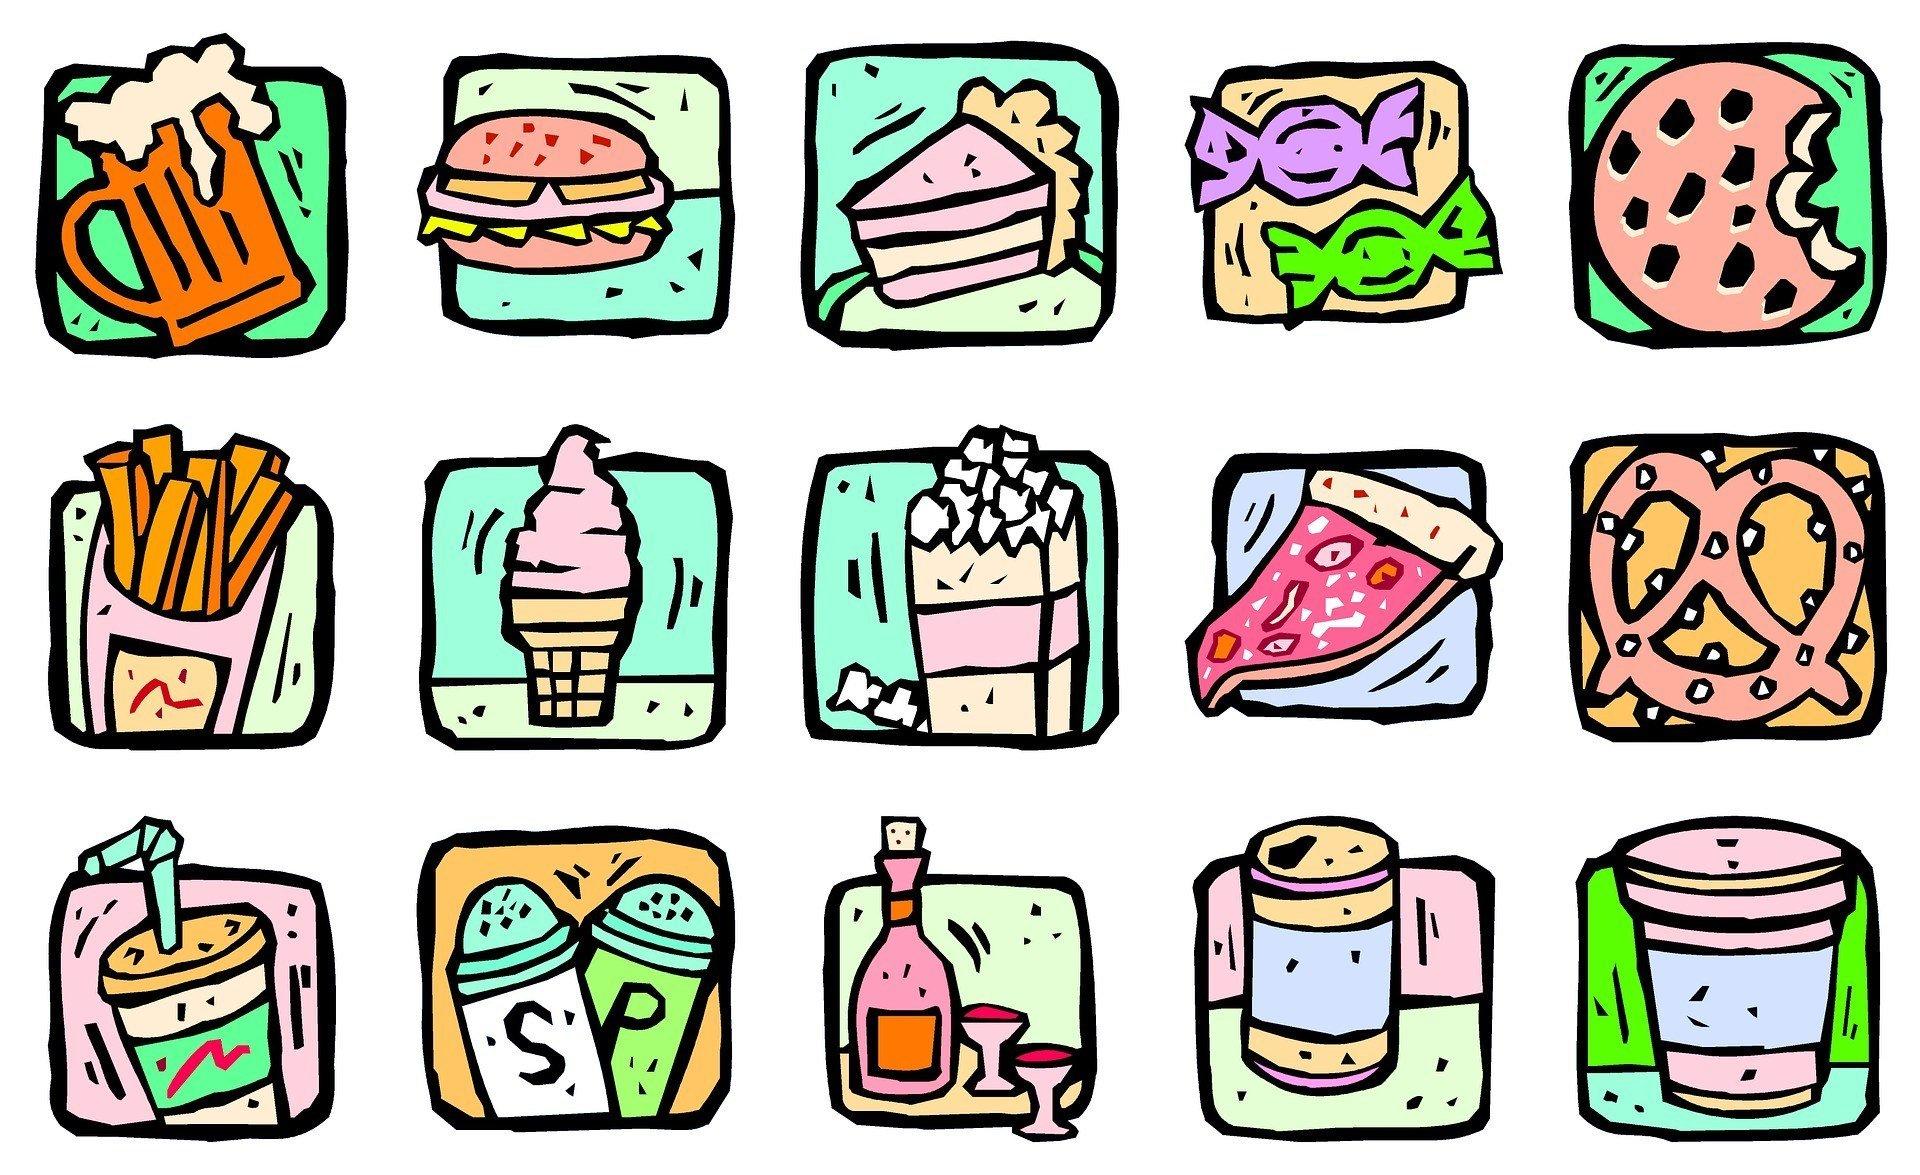 10 Foods You Should Under No Circumstances Eat Again